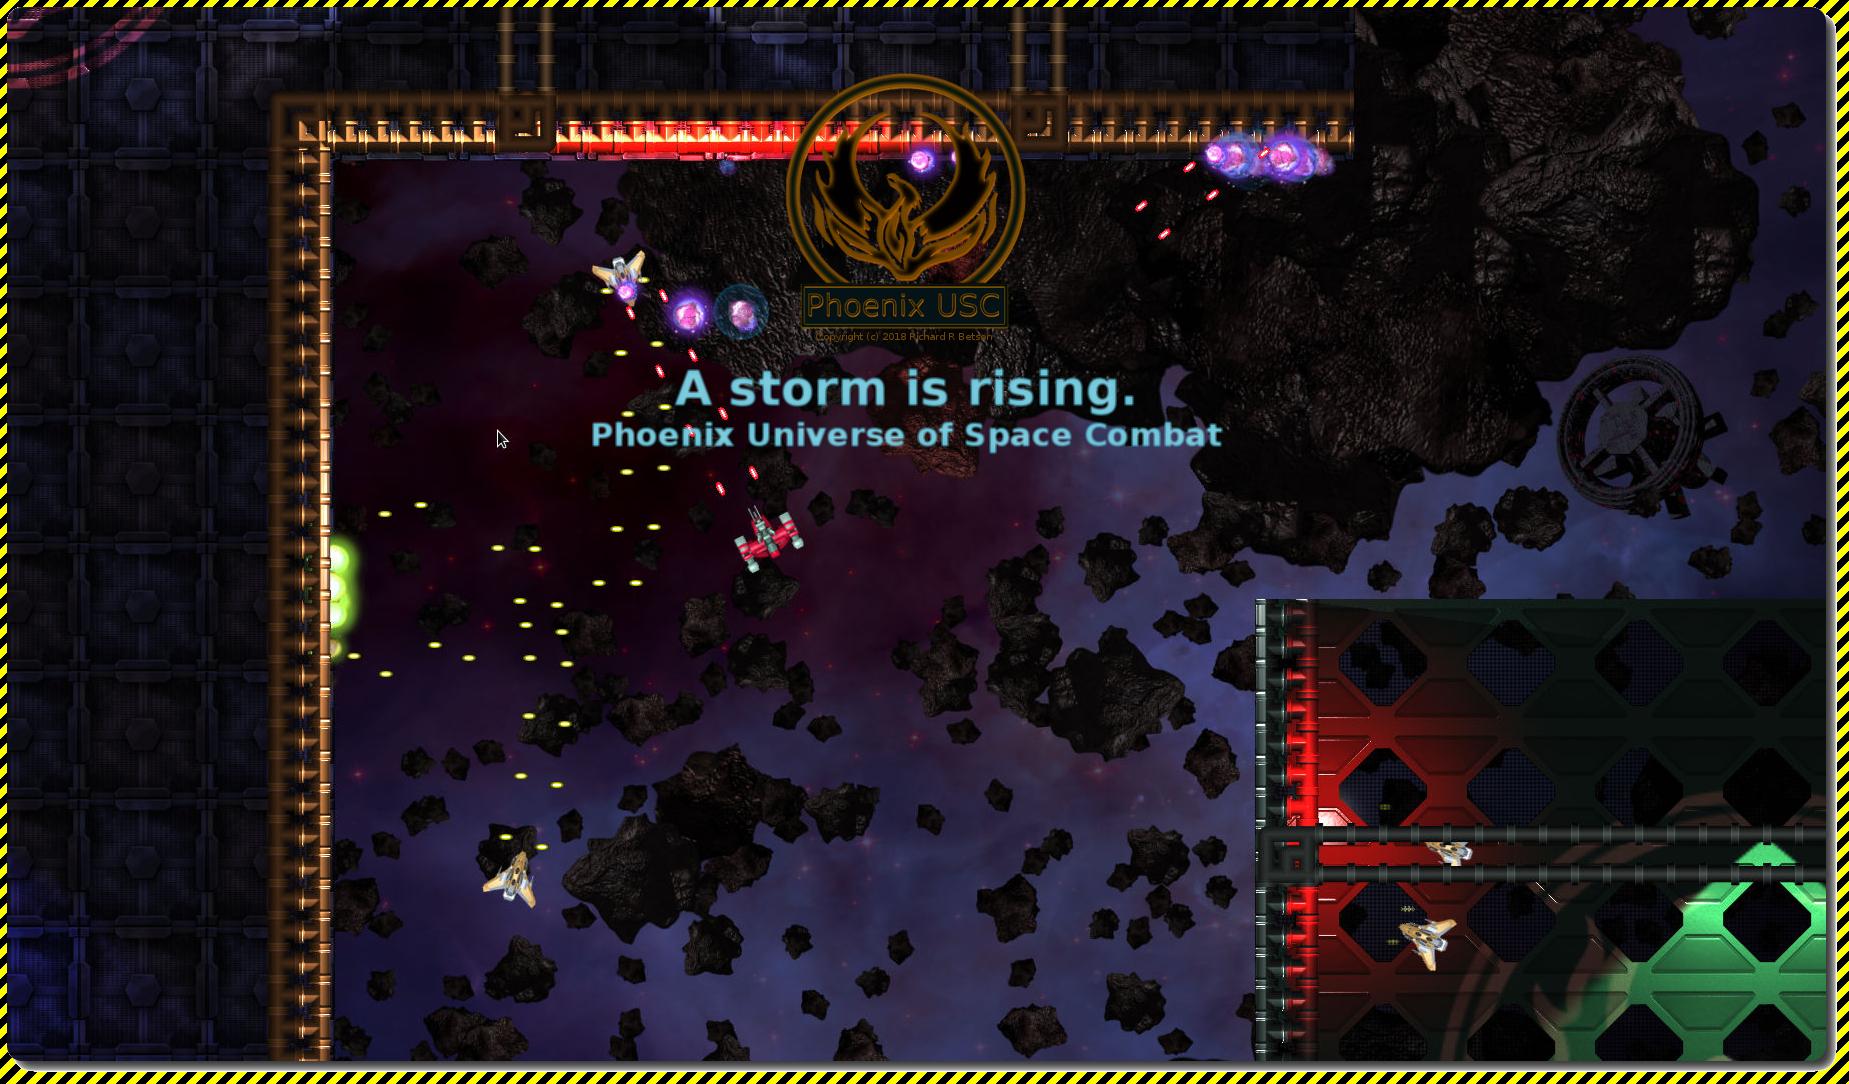 Phoenix Universe of Space Combat Windows, Mac, Linux, Web